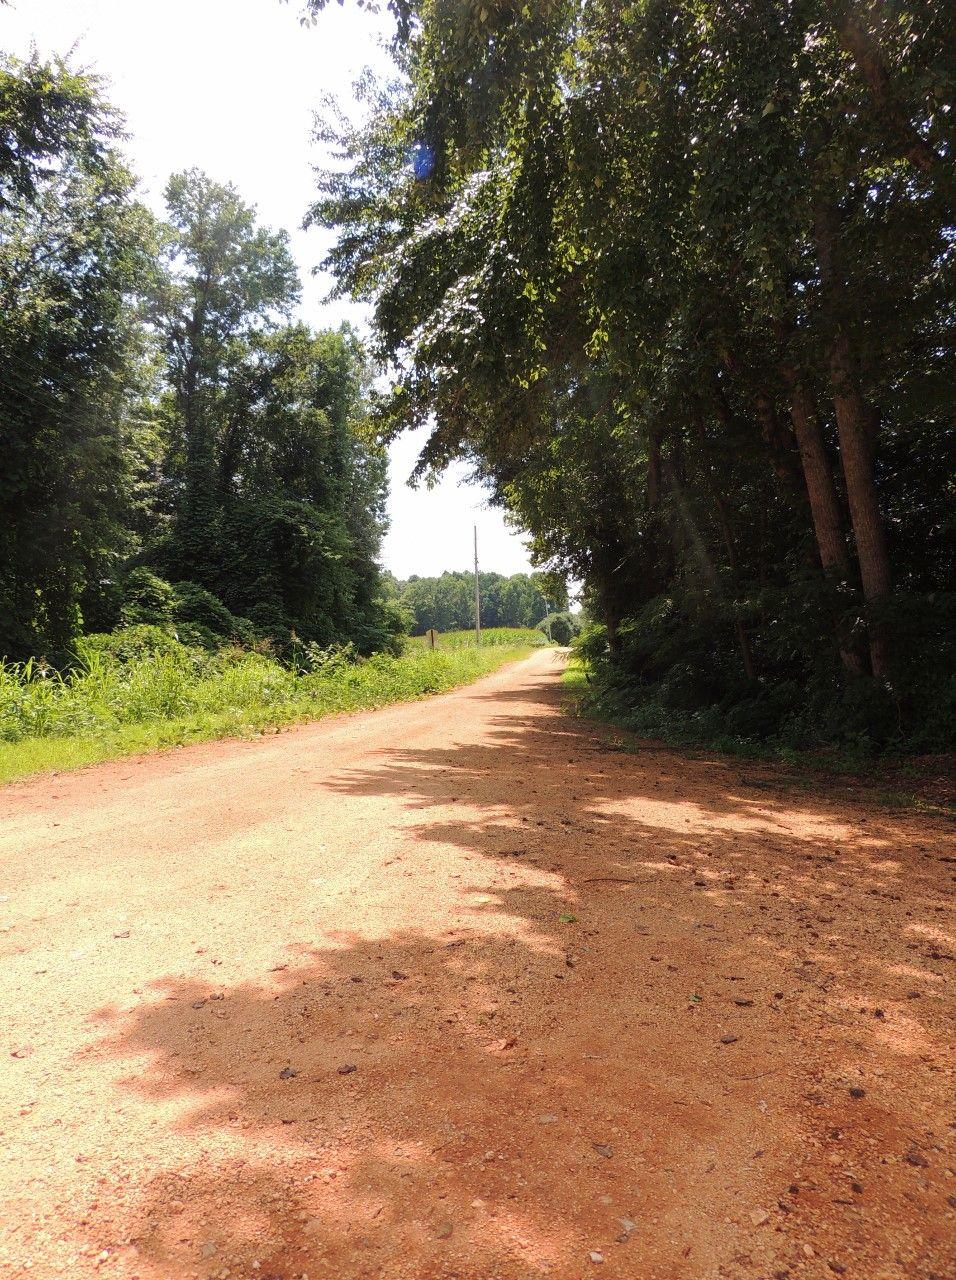 384 Alabama Countryside Countryside Country Roads